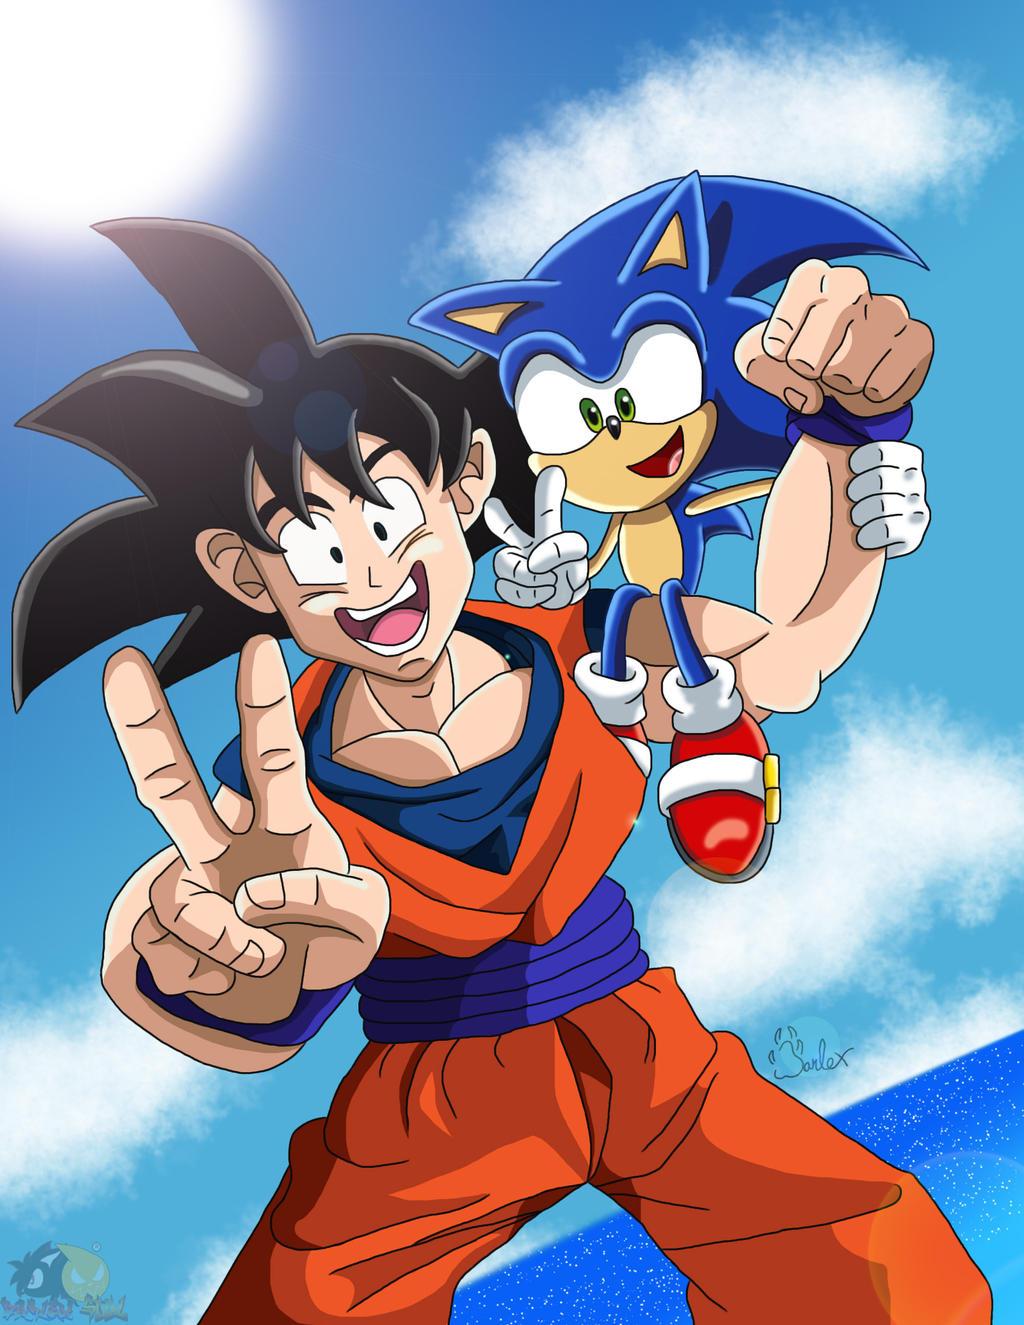 Goku And Sonic by boywolf on DeviantArt